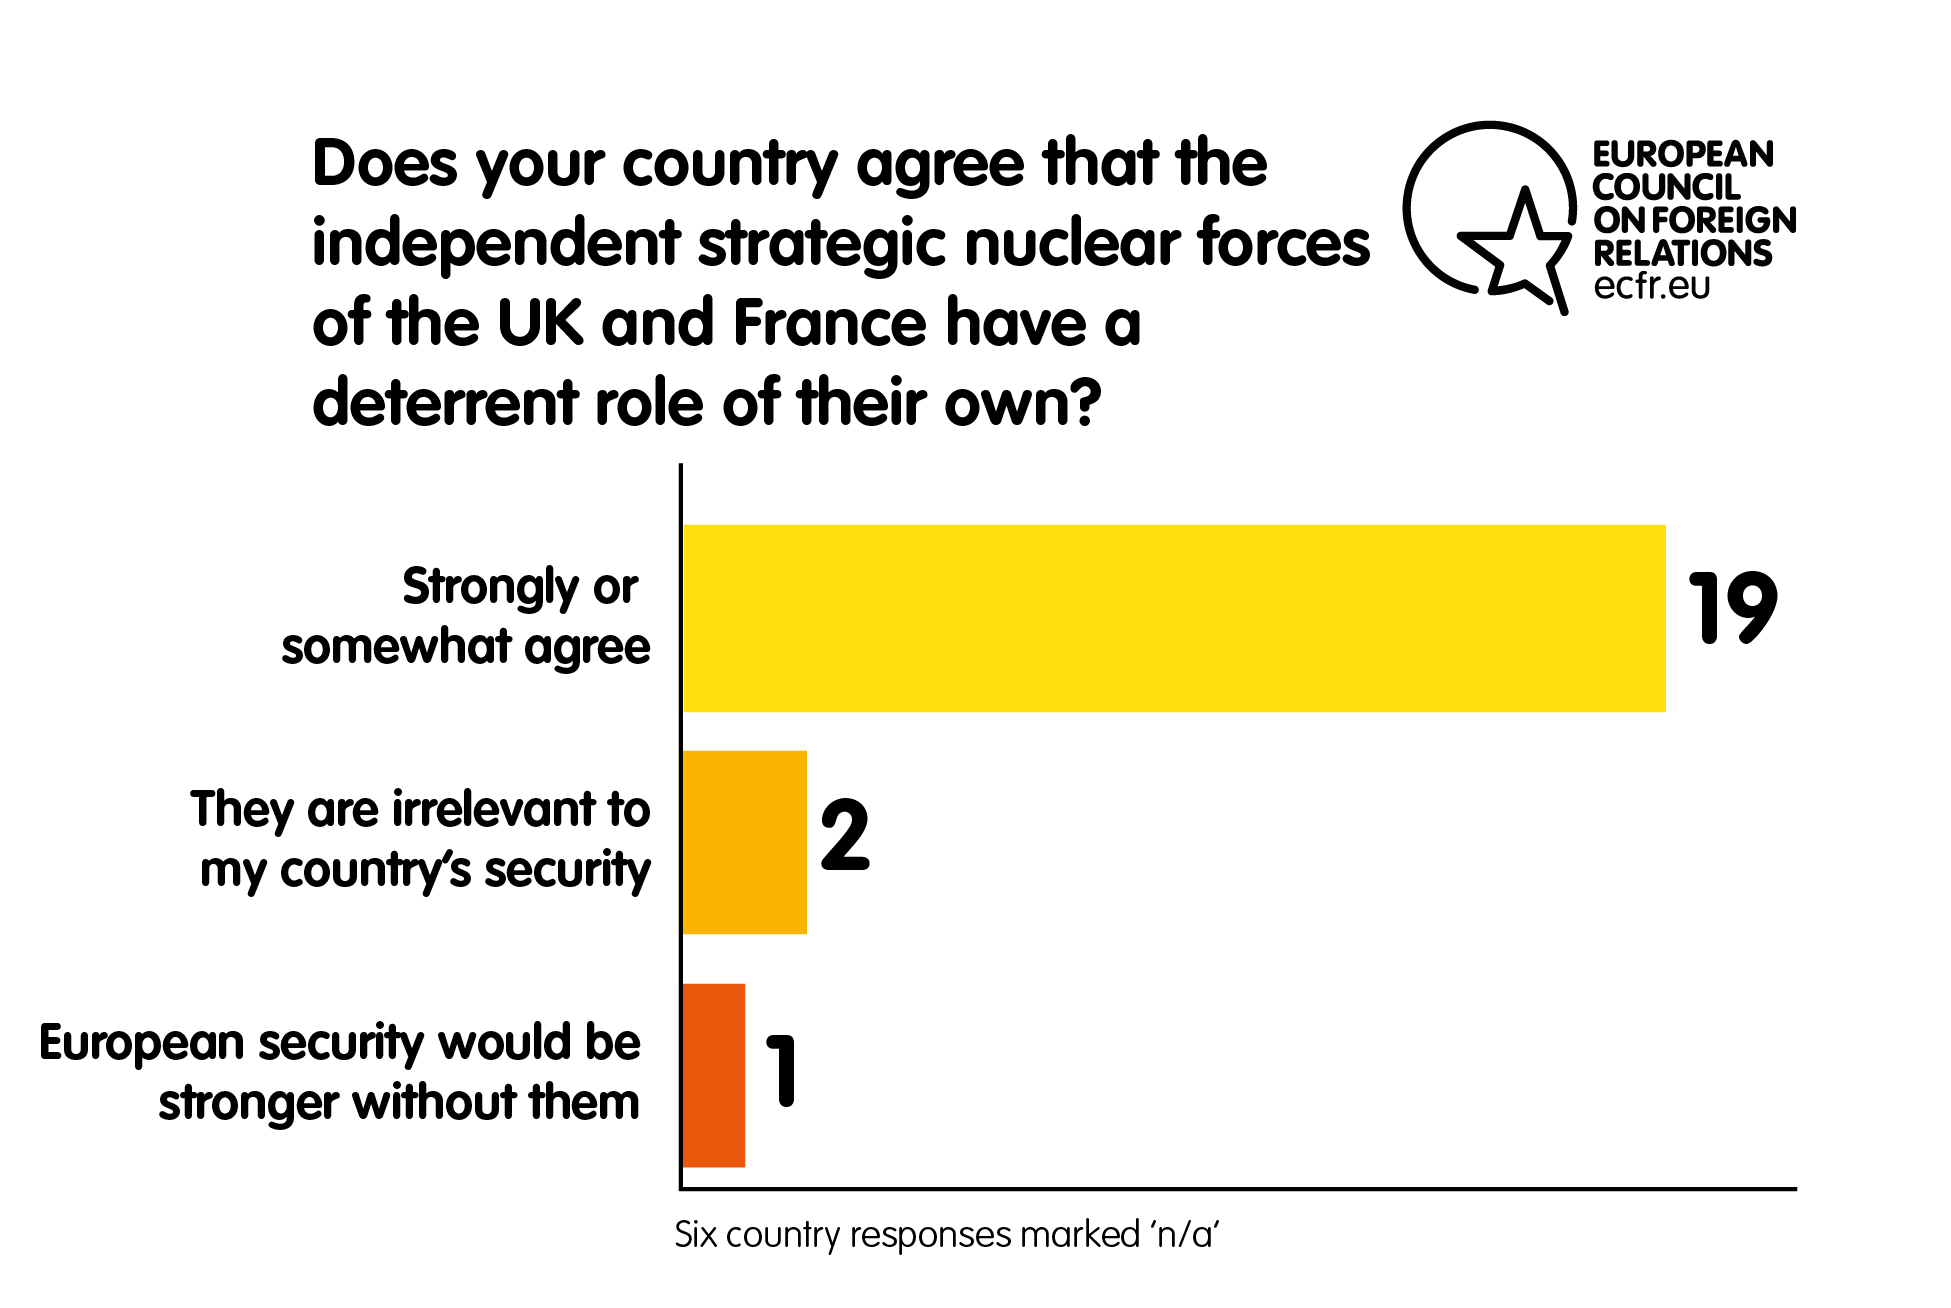 Eyes tight shut: European attitudes towards nuclear deterrence